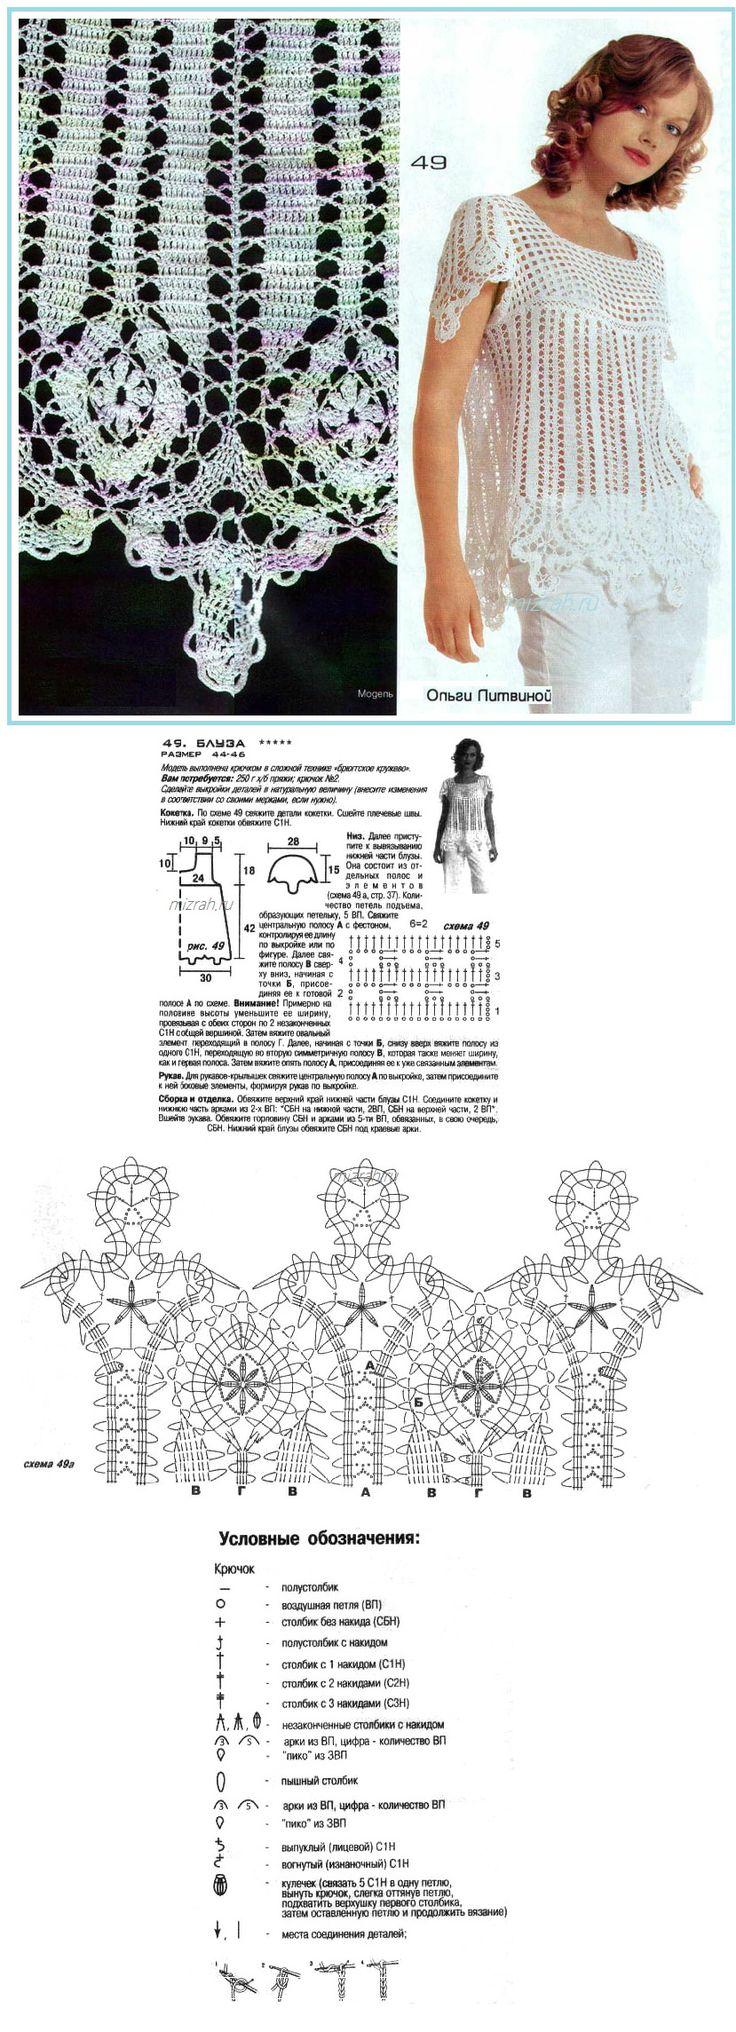 bruggia lace - crochet top